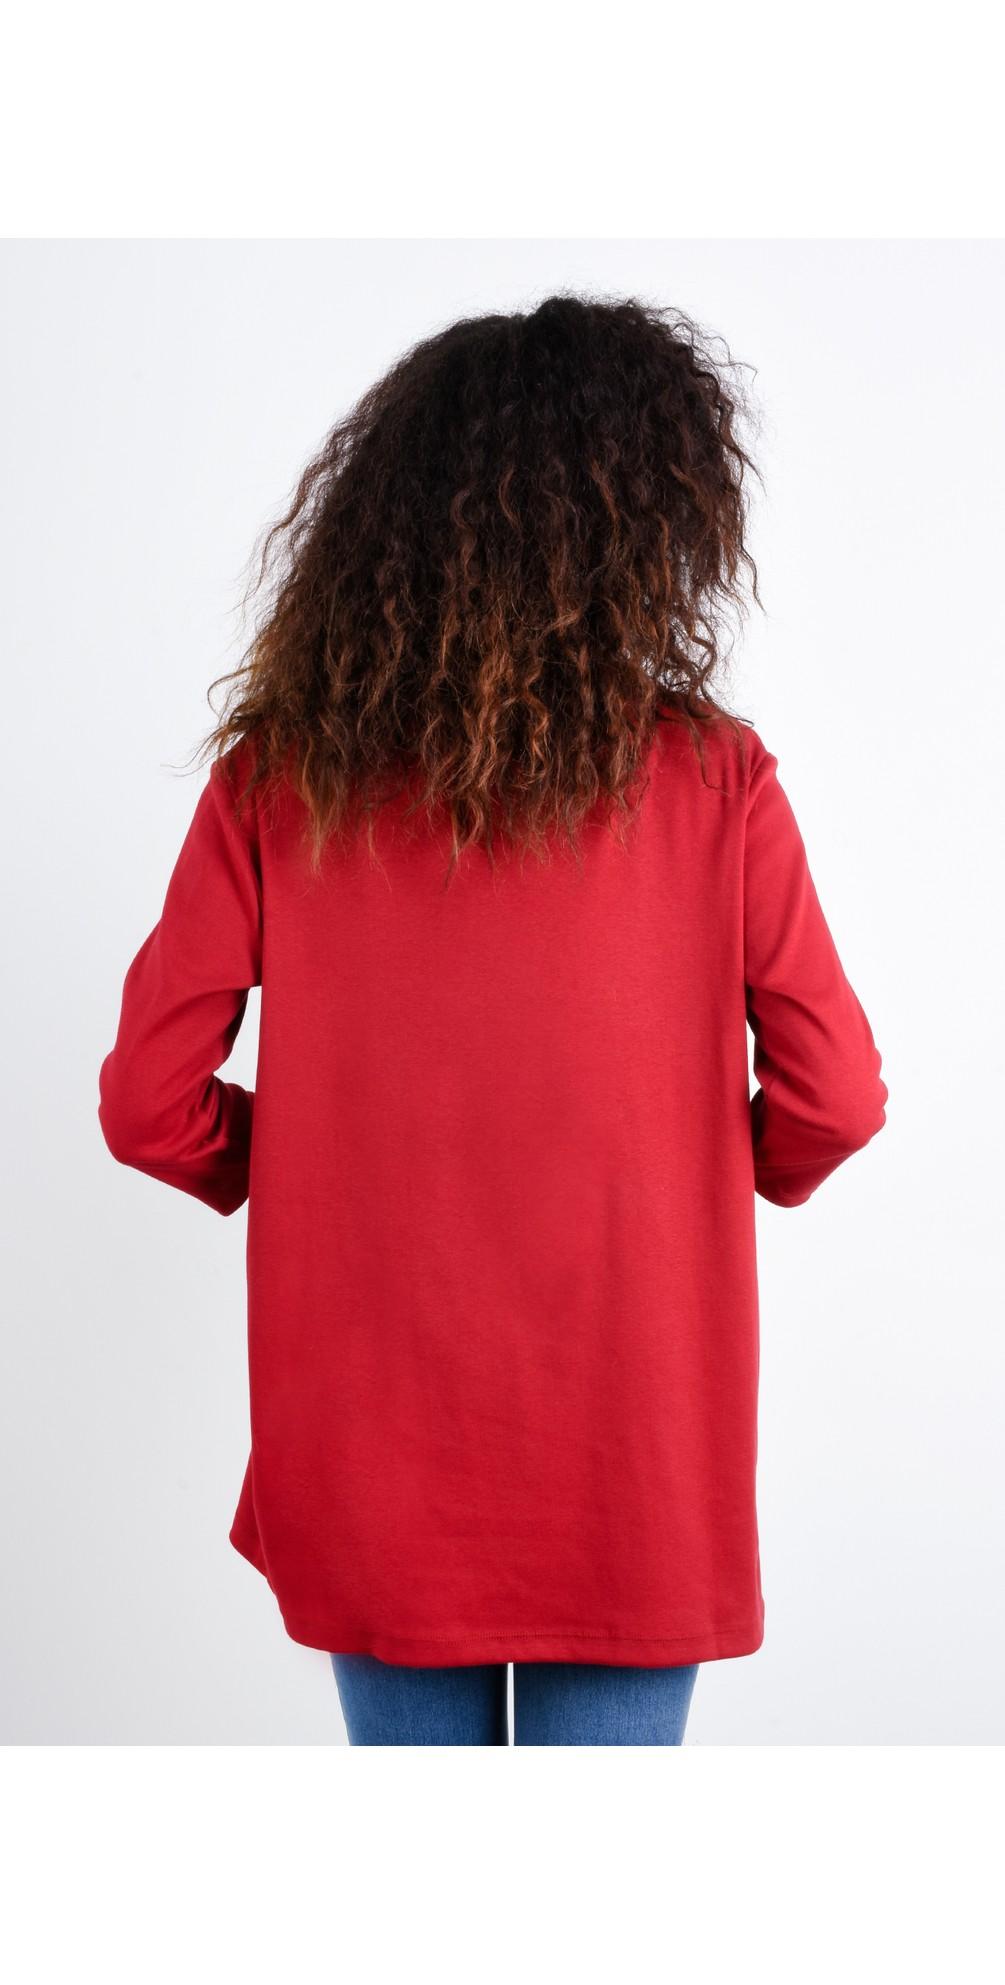 Clara Easyfit Organic Cotton Roll Neck Top main image